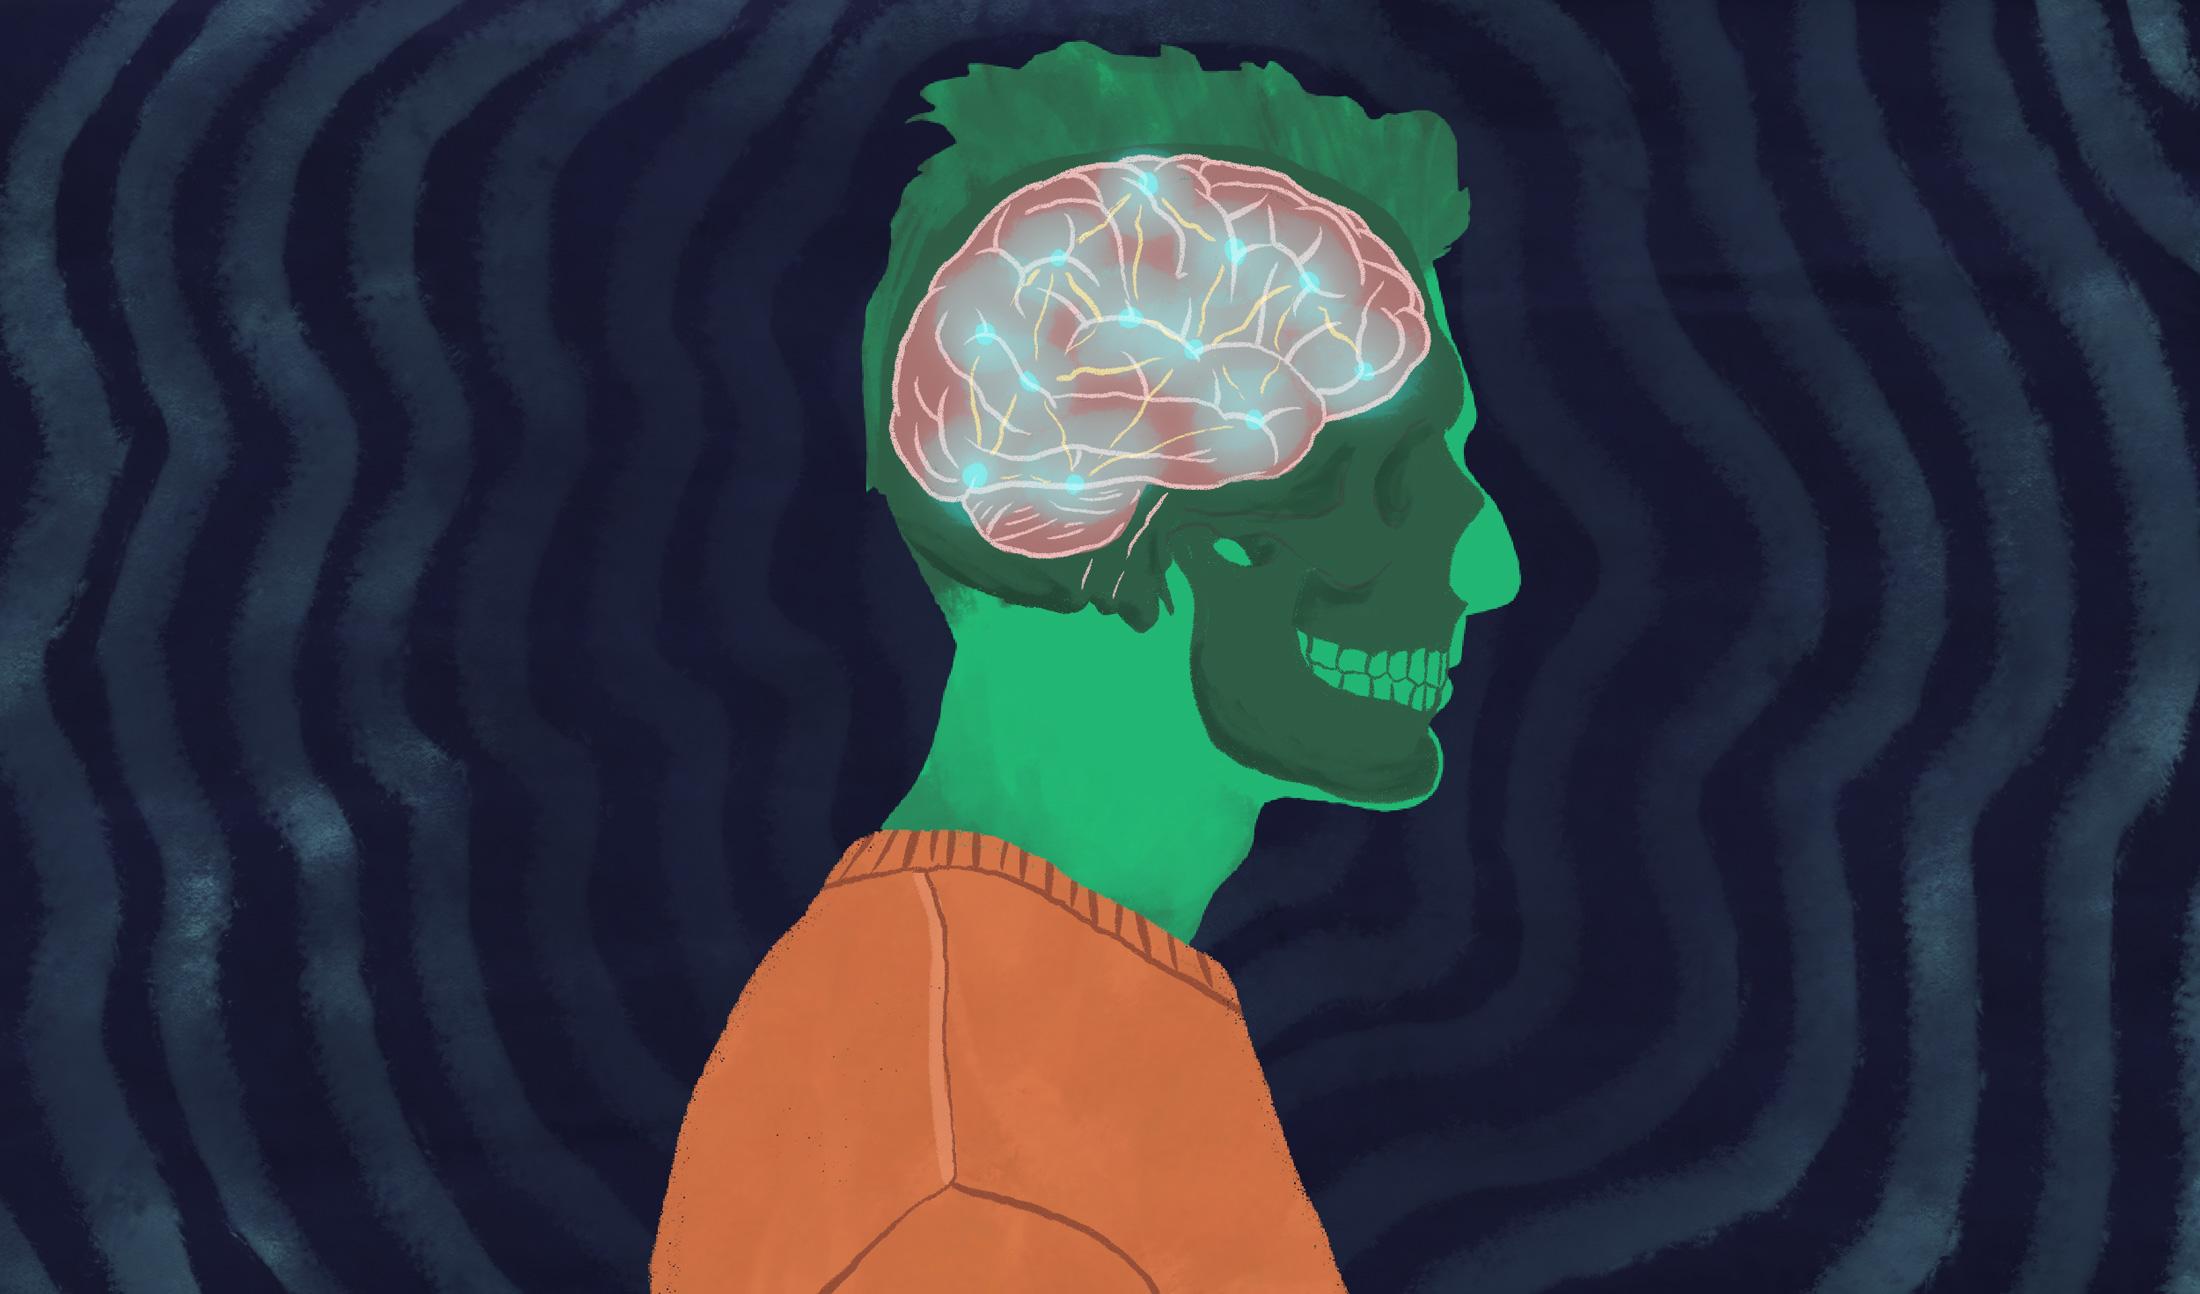 Formation of Habitual Use Drives Cannabis Addiction